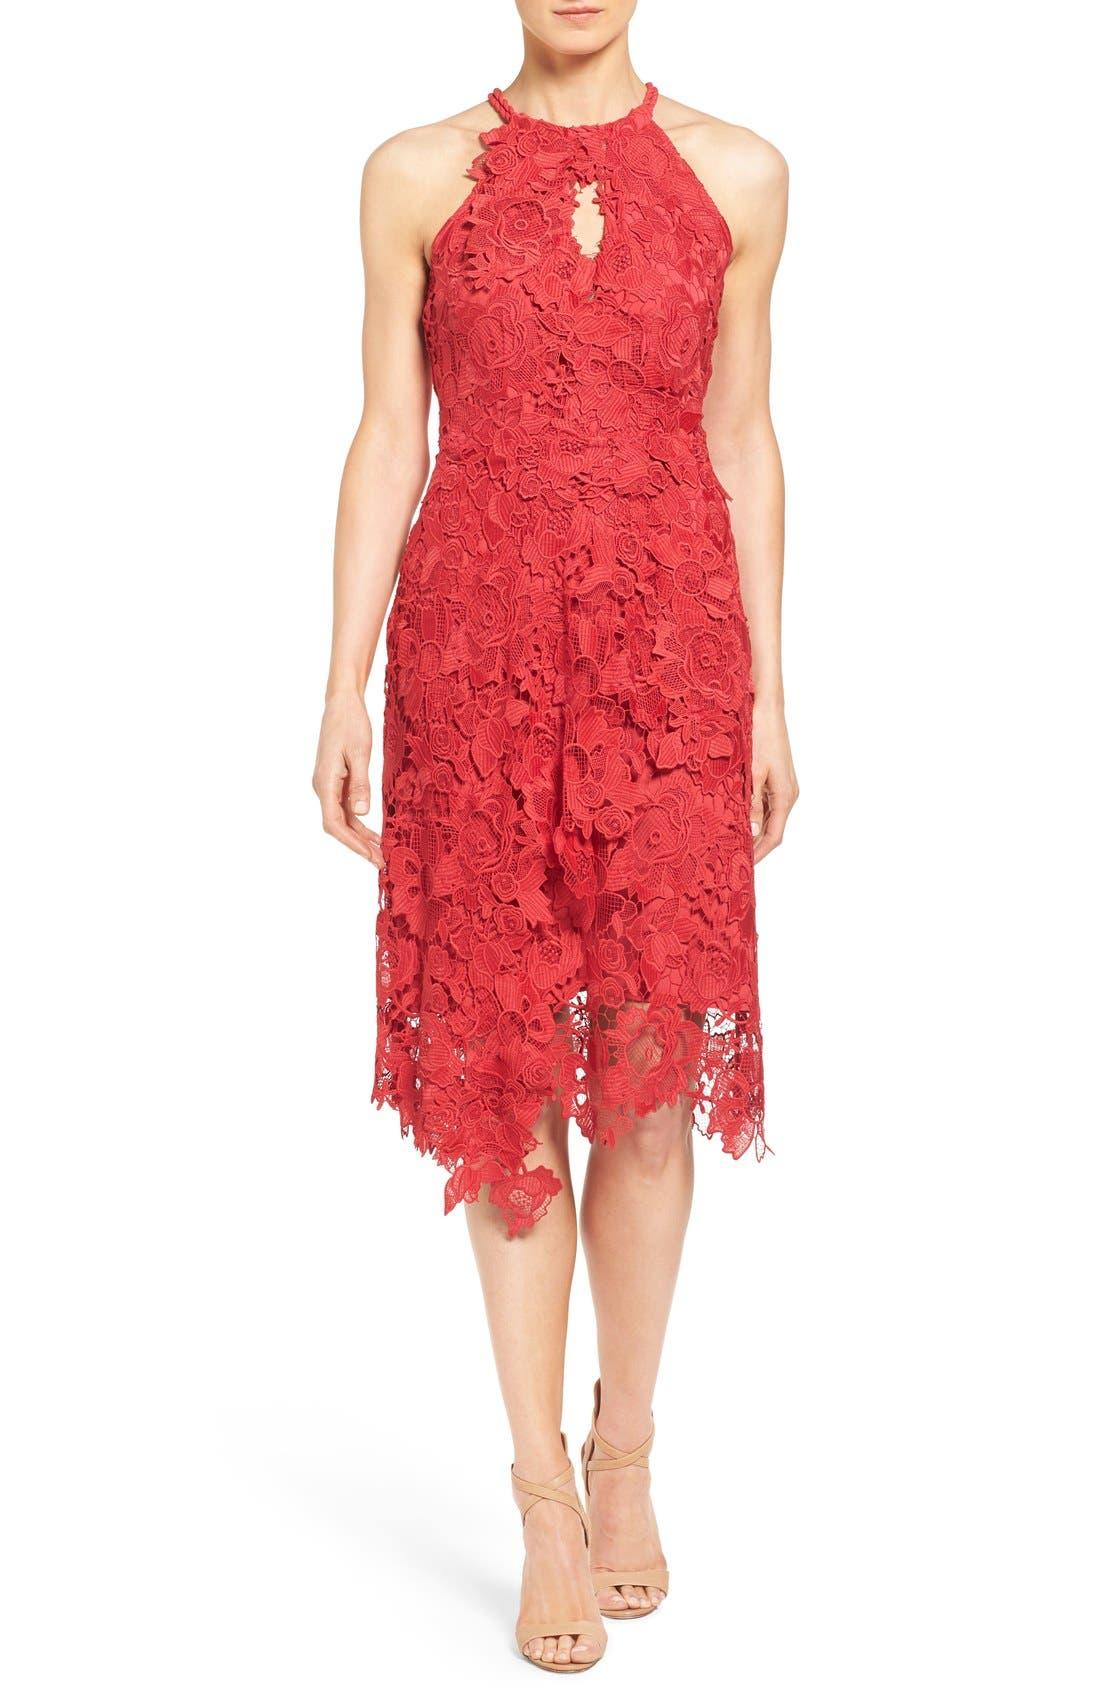 Alternate Image 1 Selected - Kobi Halperin 'Jade' Asymmetrical Hem Halter Style Lace Dress